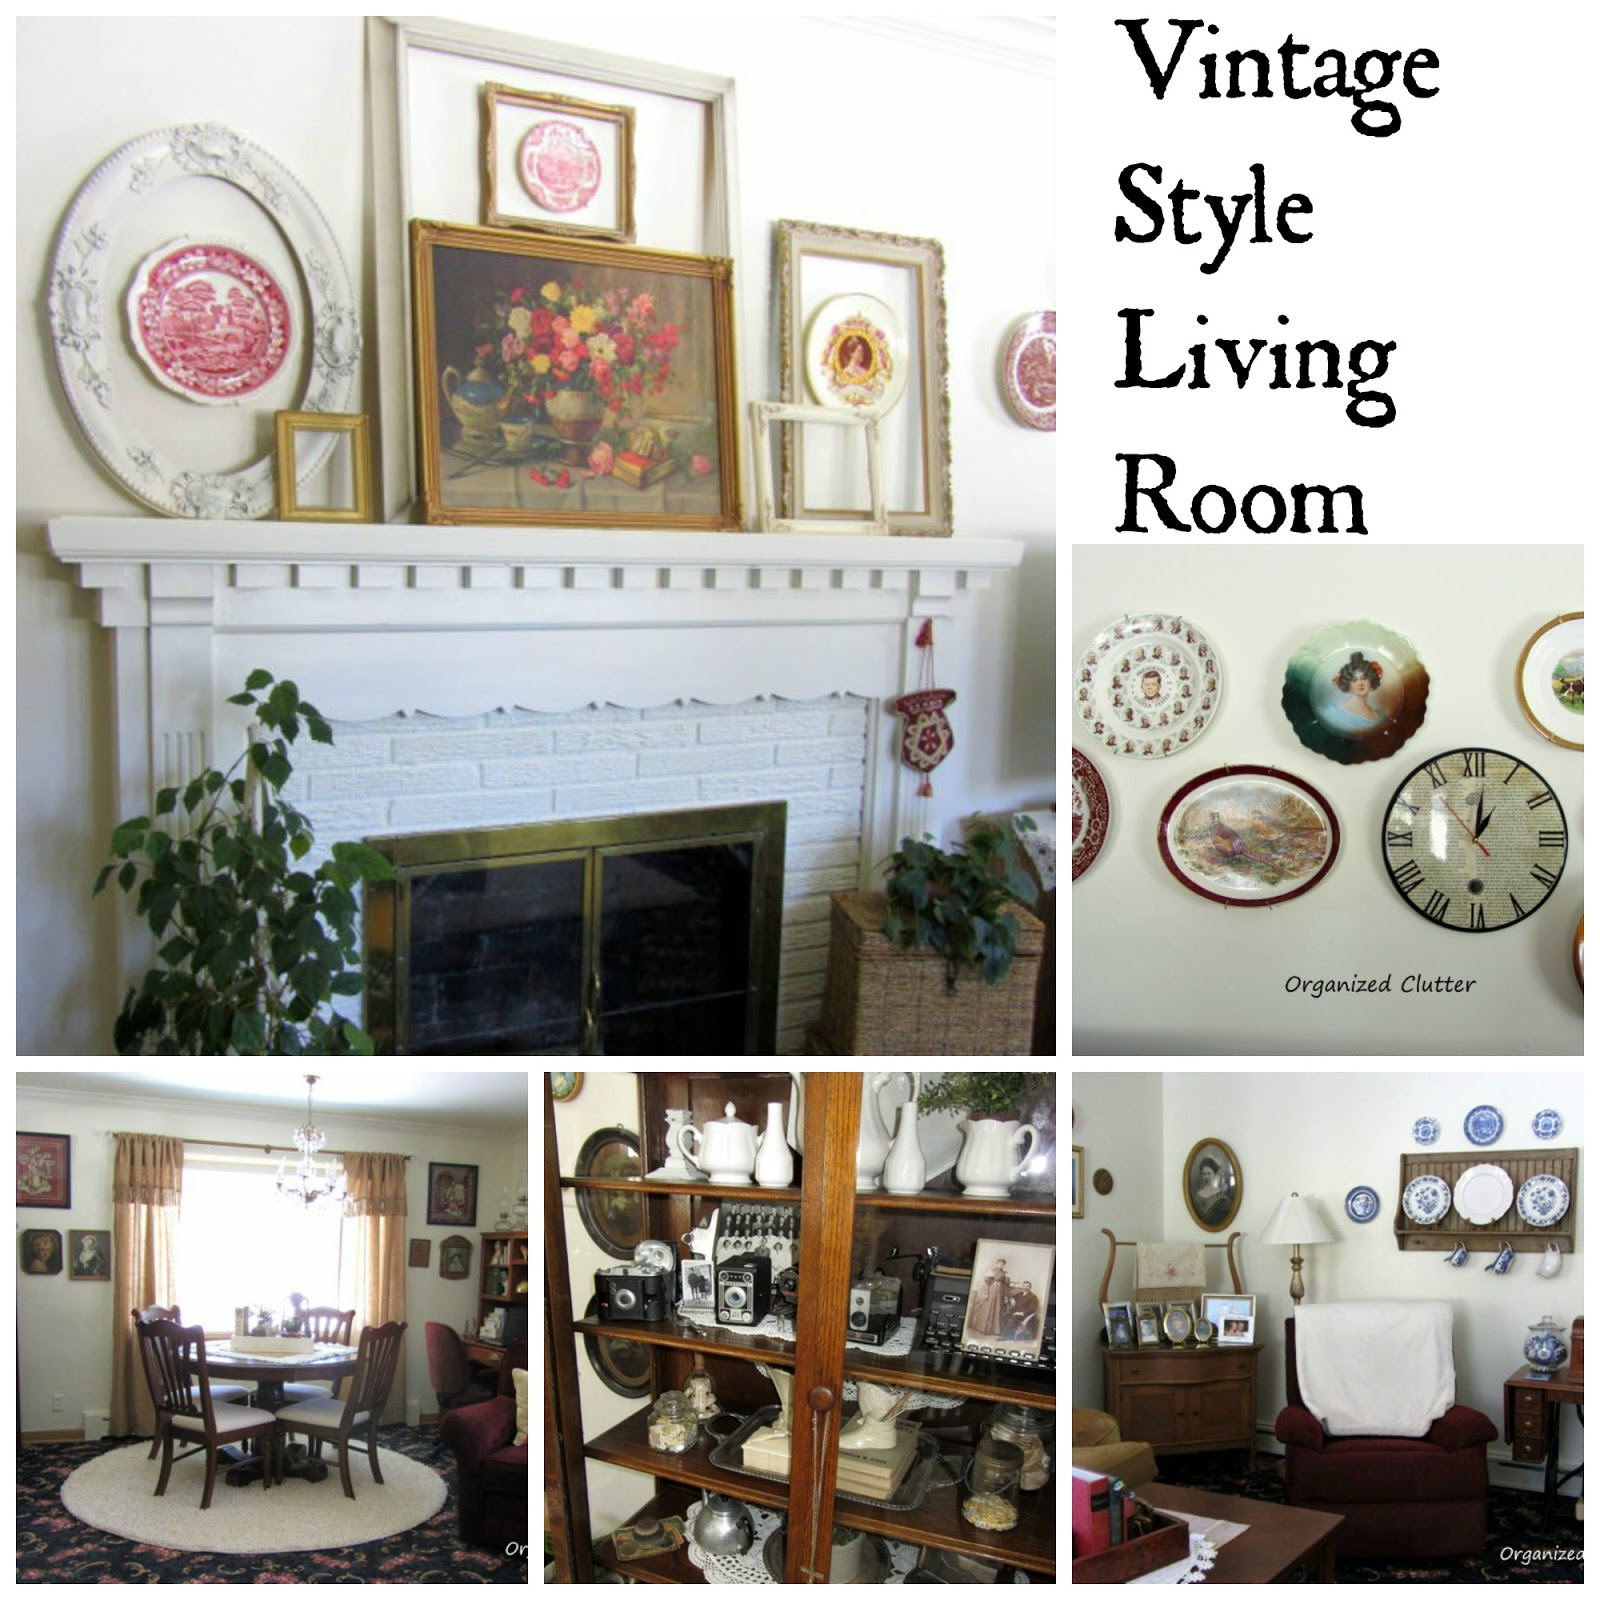 Vintage Living Room Tour www.organizedclutterqueen.blogspot.com